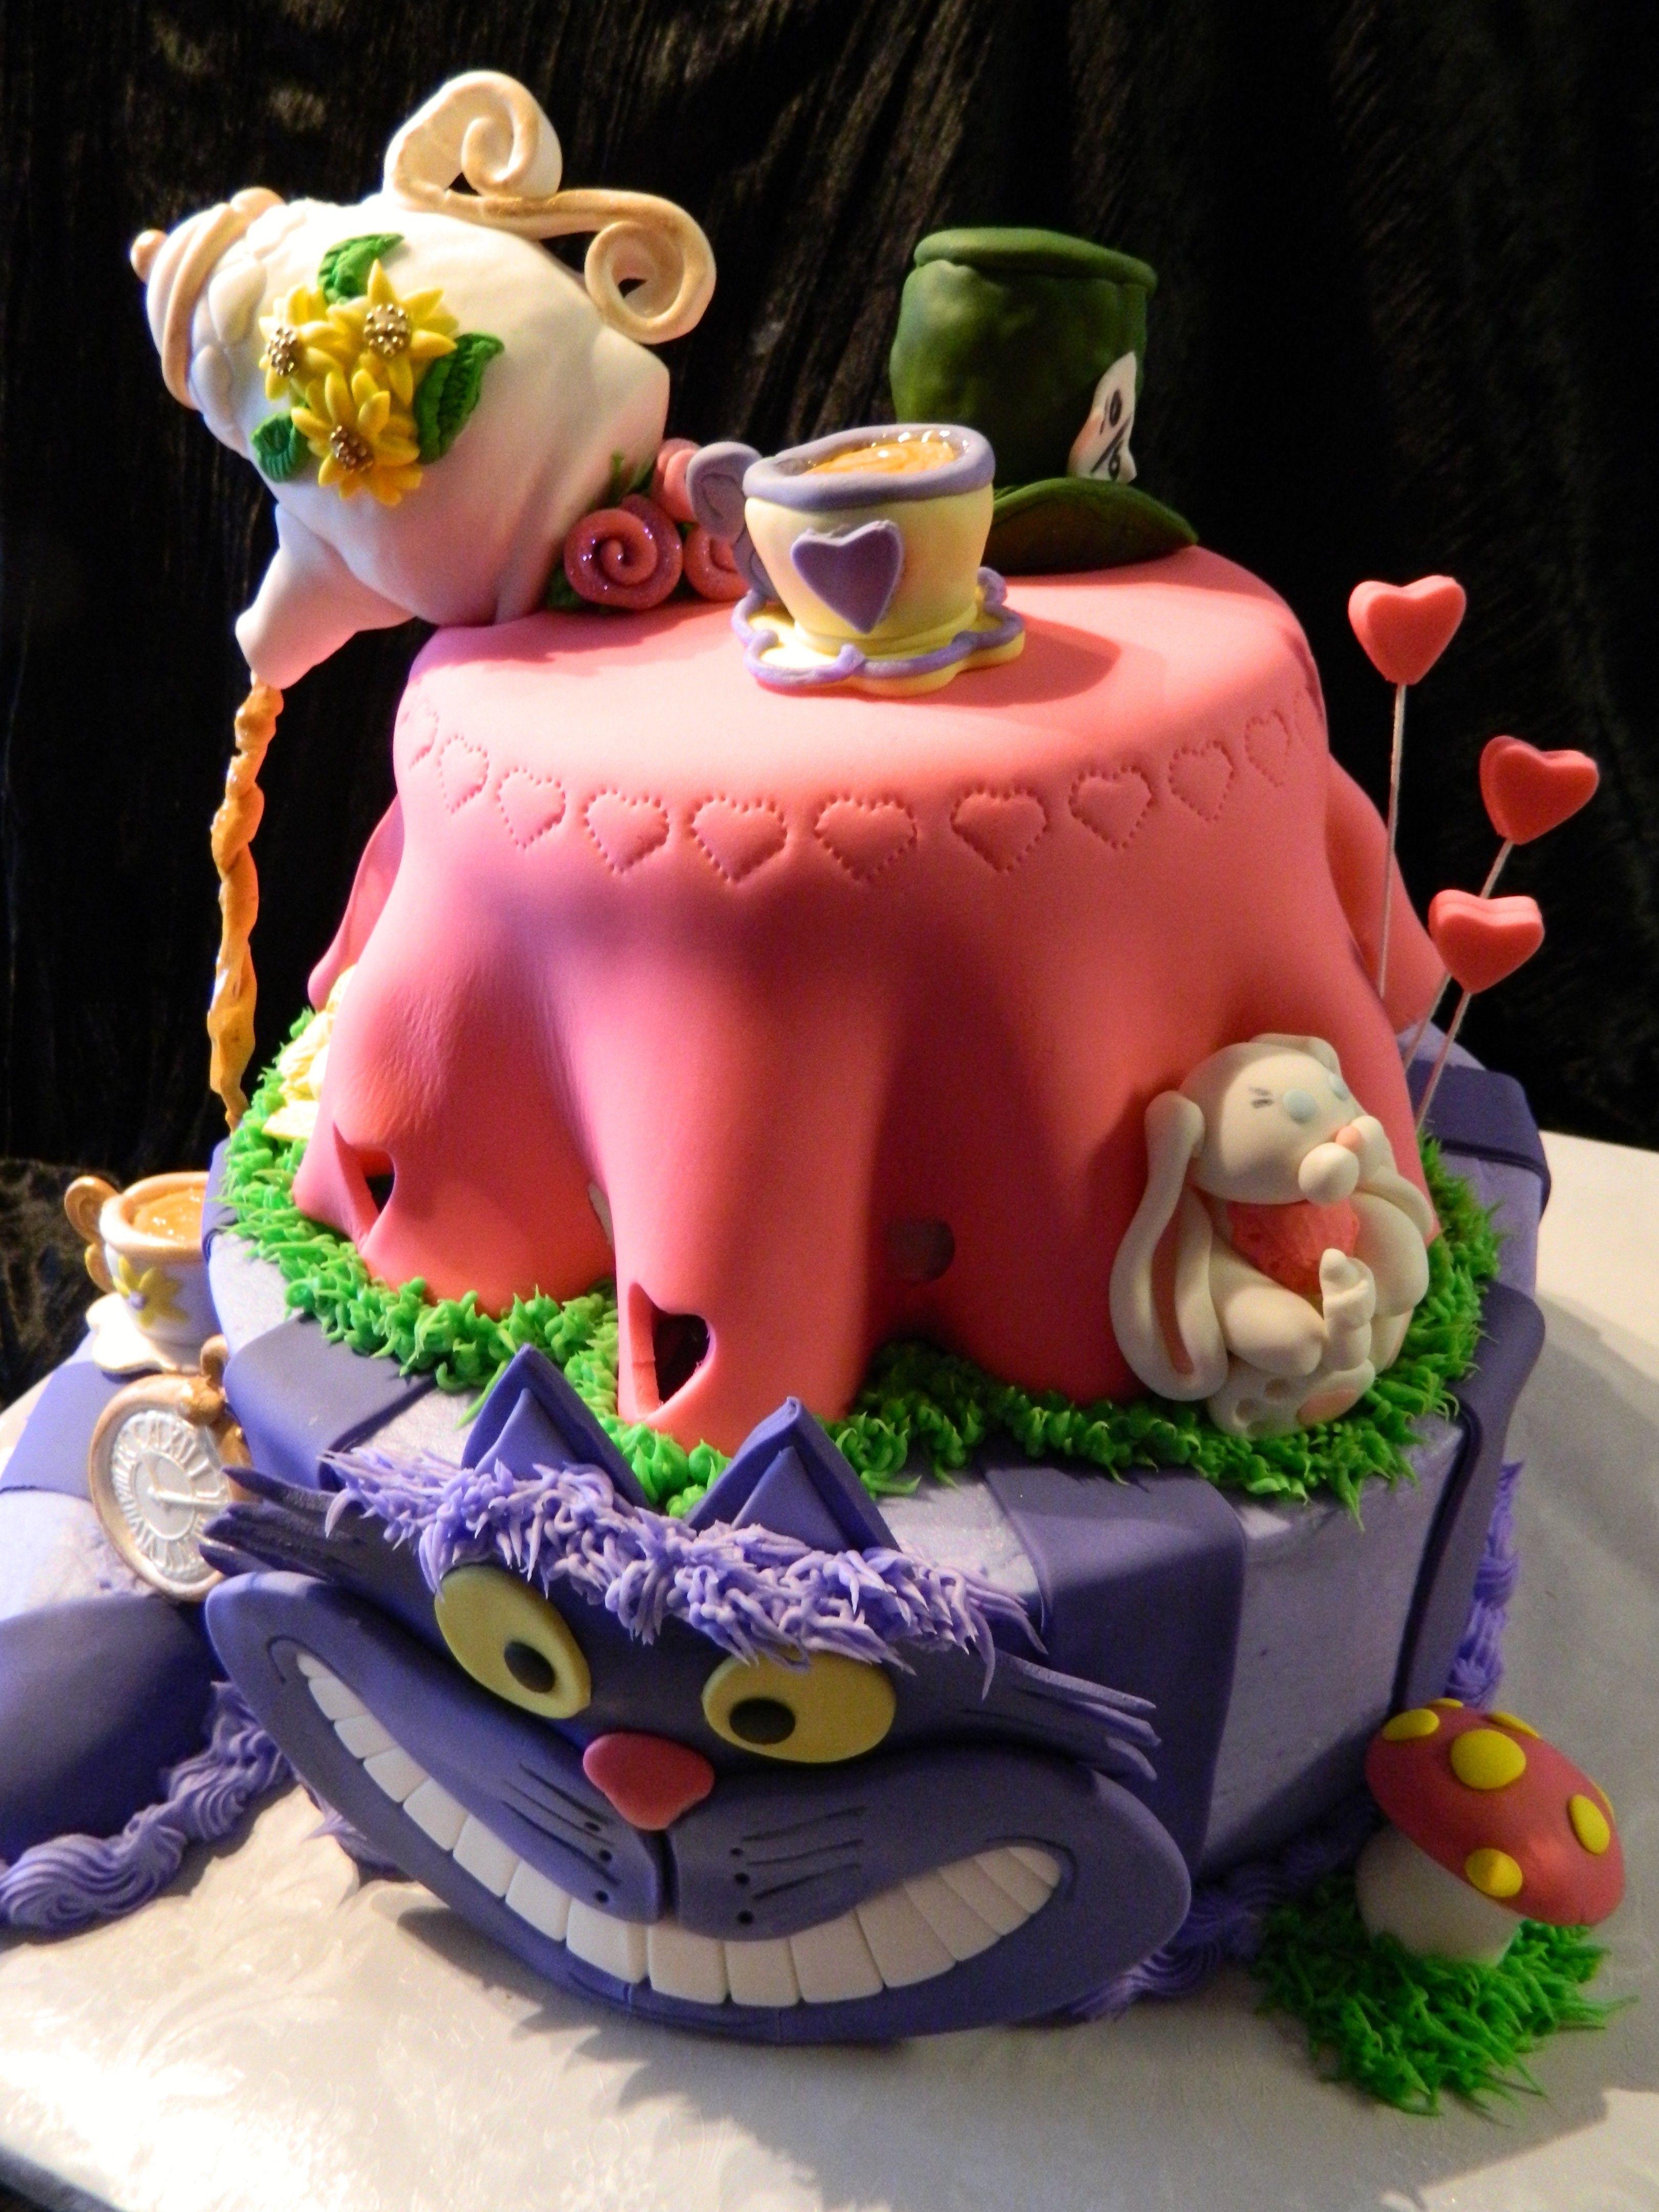 Birthday Ideas 12 Year Old Birthday Cake Ideas For A Girl Cakes